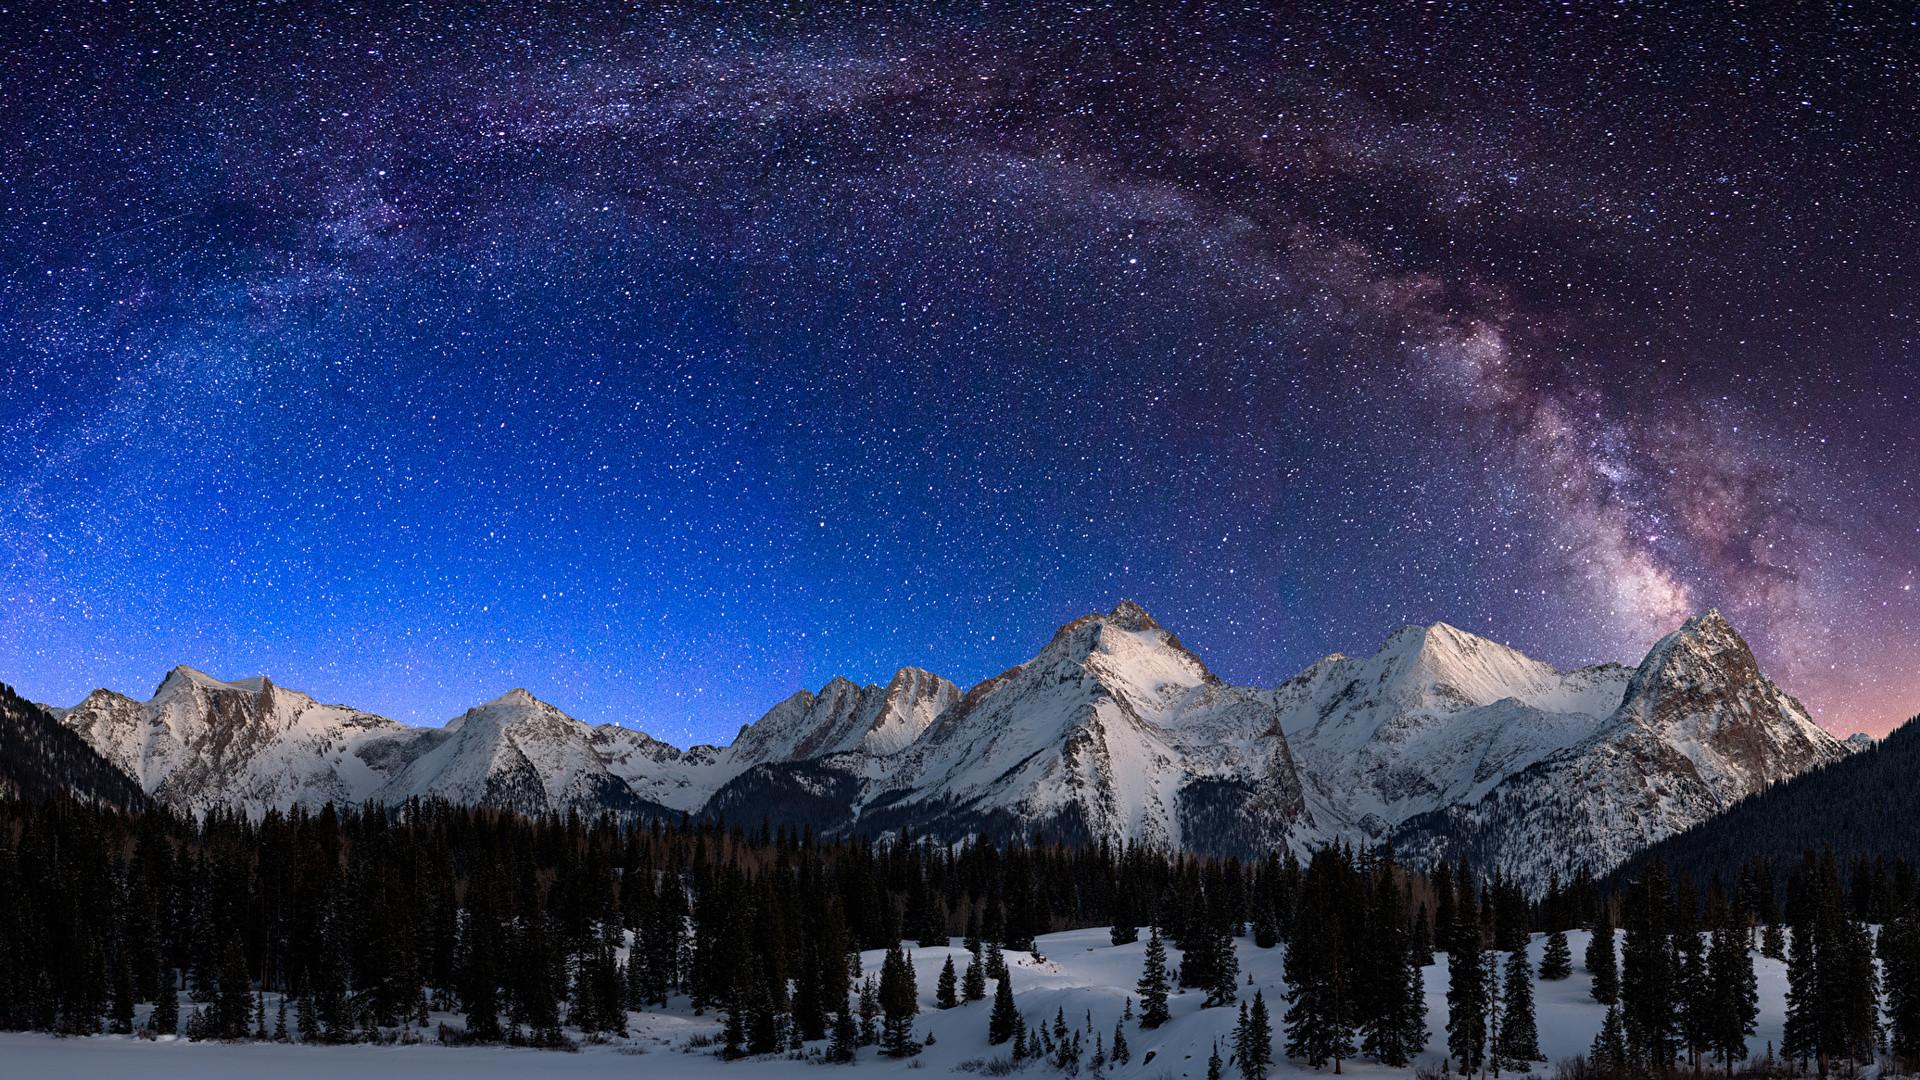 Www 1080walpaper Com: Milky Way Wallpaper 1920x1080 (71+ Images